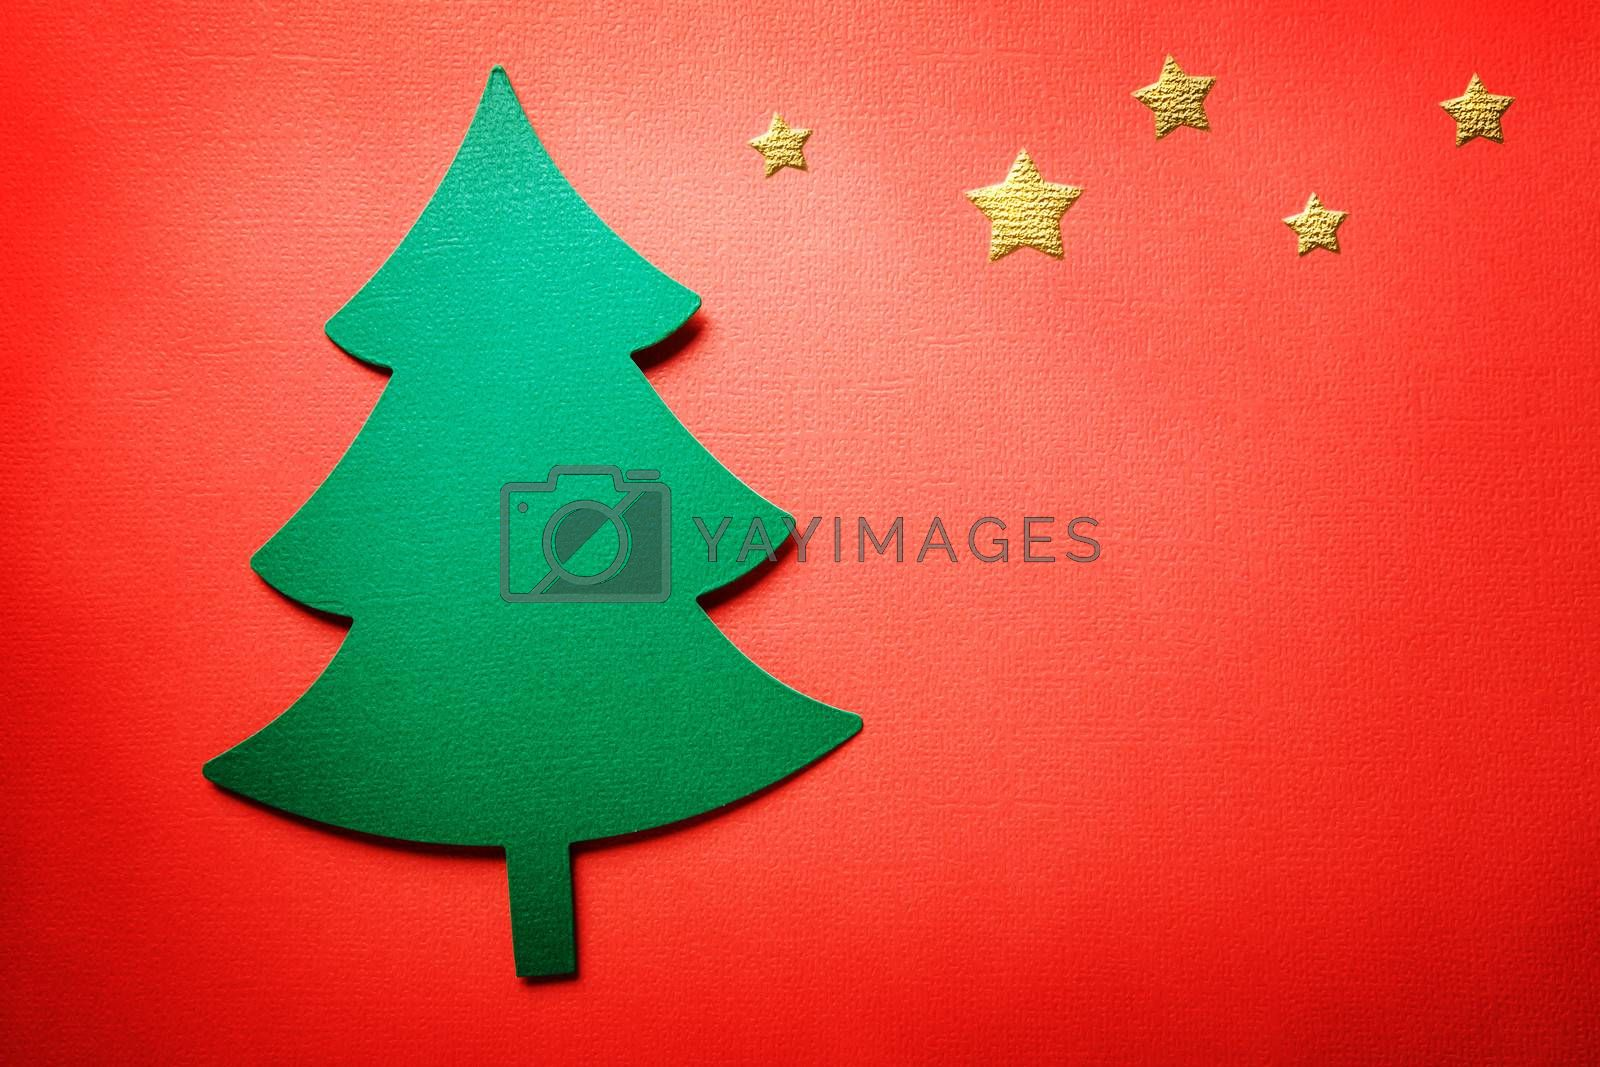 Royalty free image of Handmade paper craft Christmas tree by melpomene